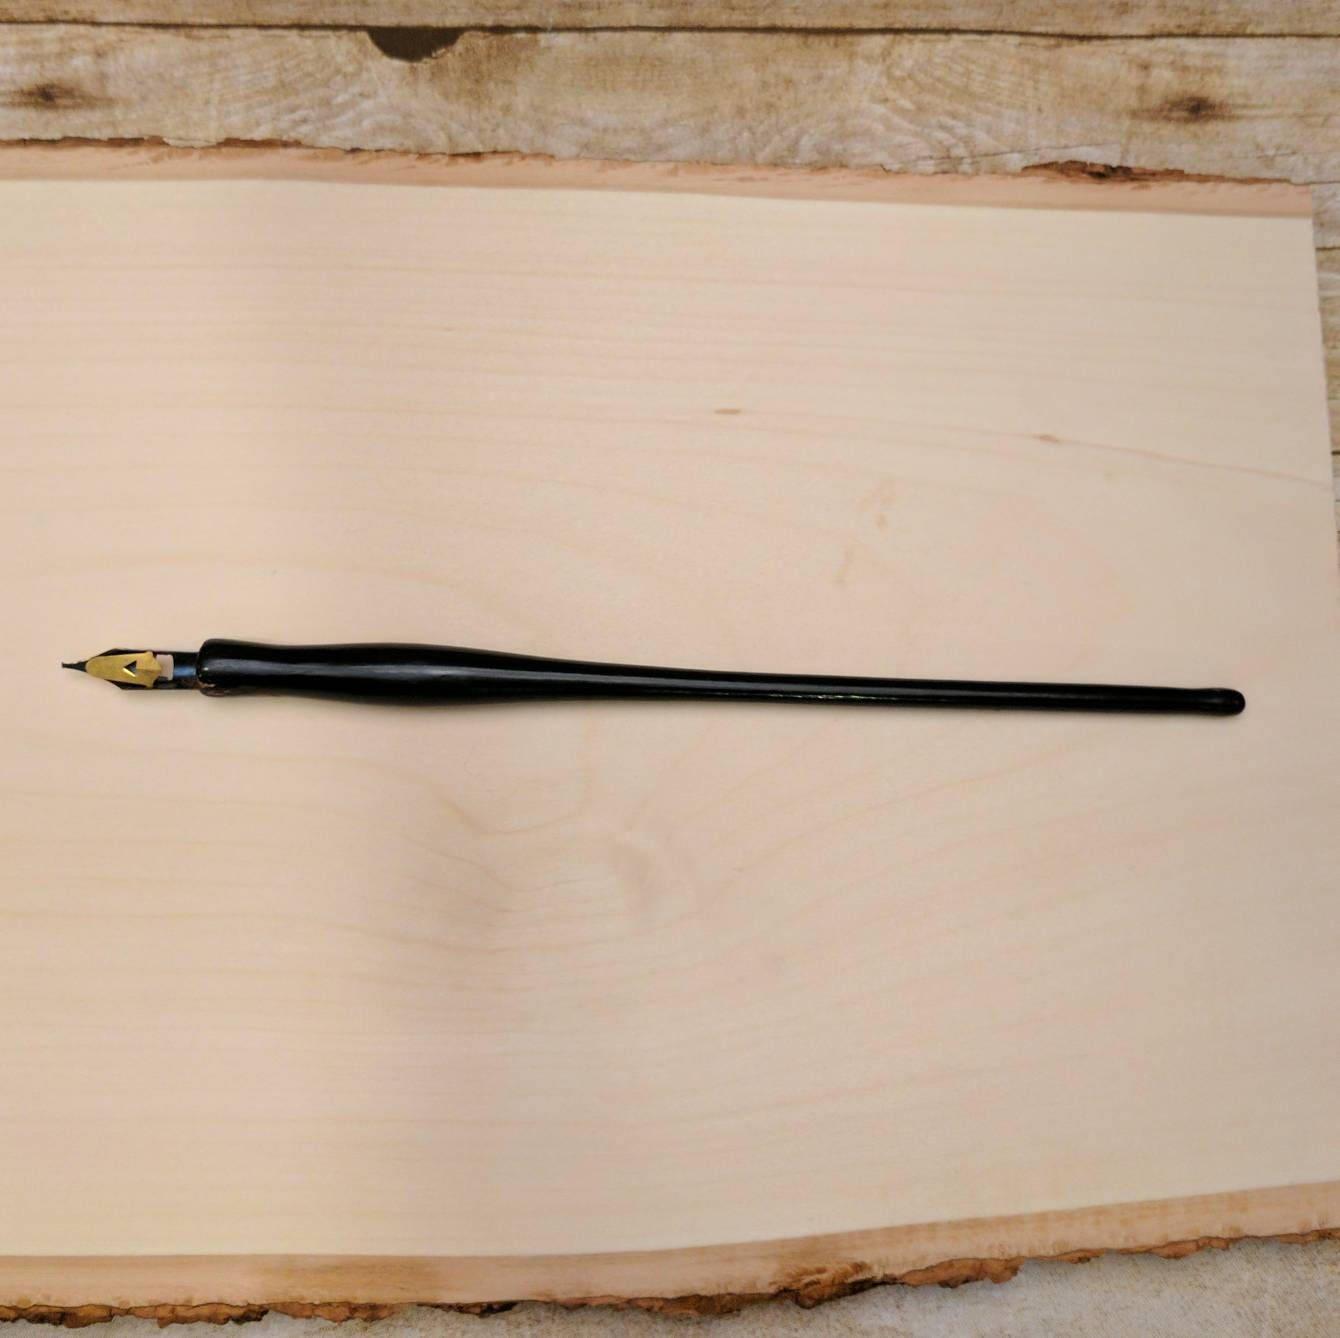 Vintage 1343 E Faber U S A Calligraphy Dip Pen With No